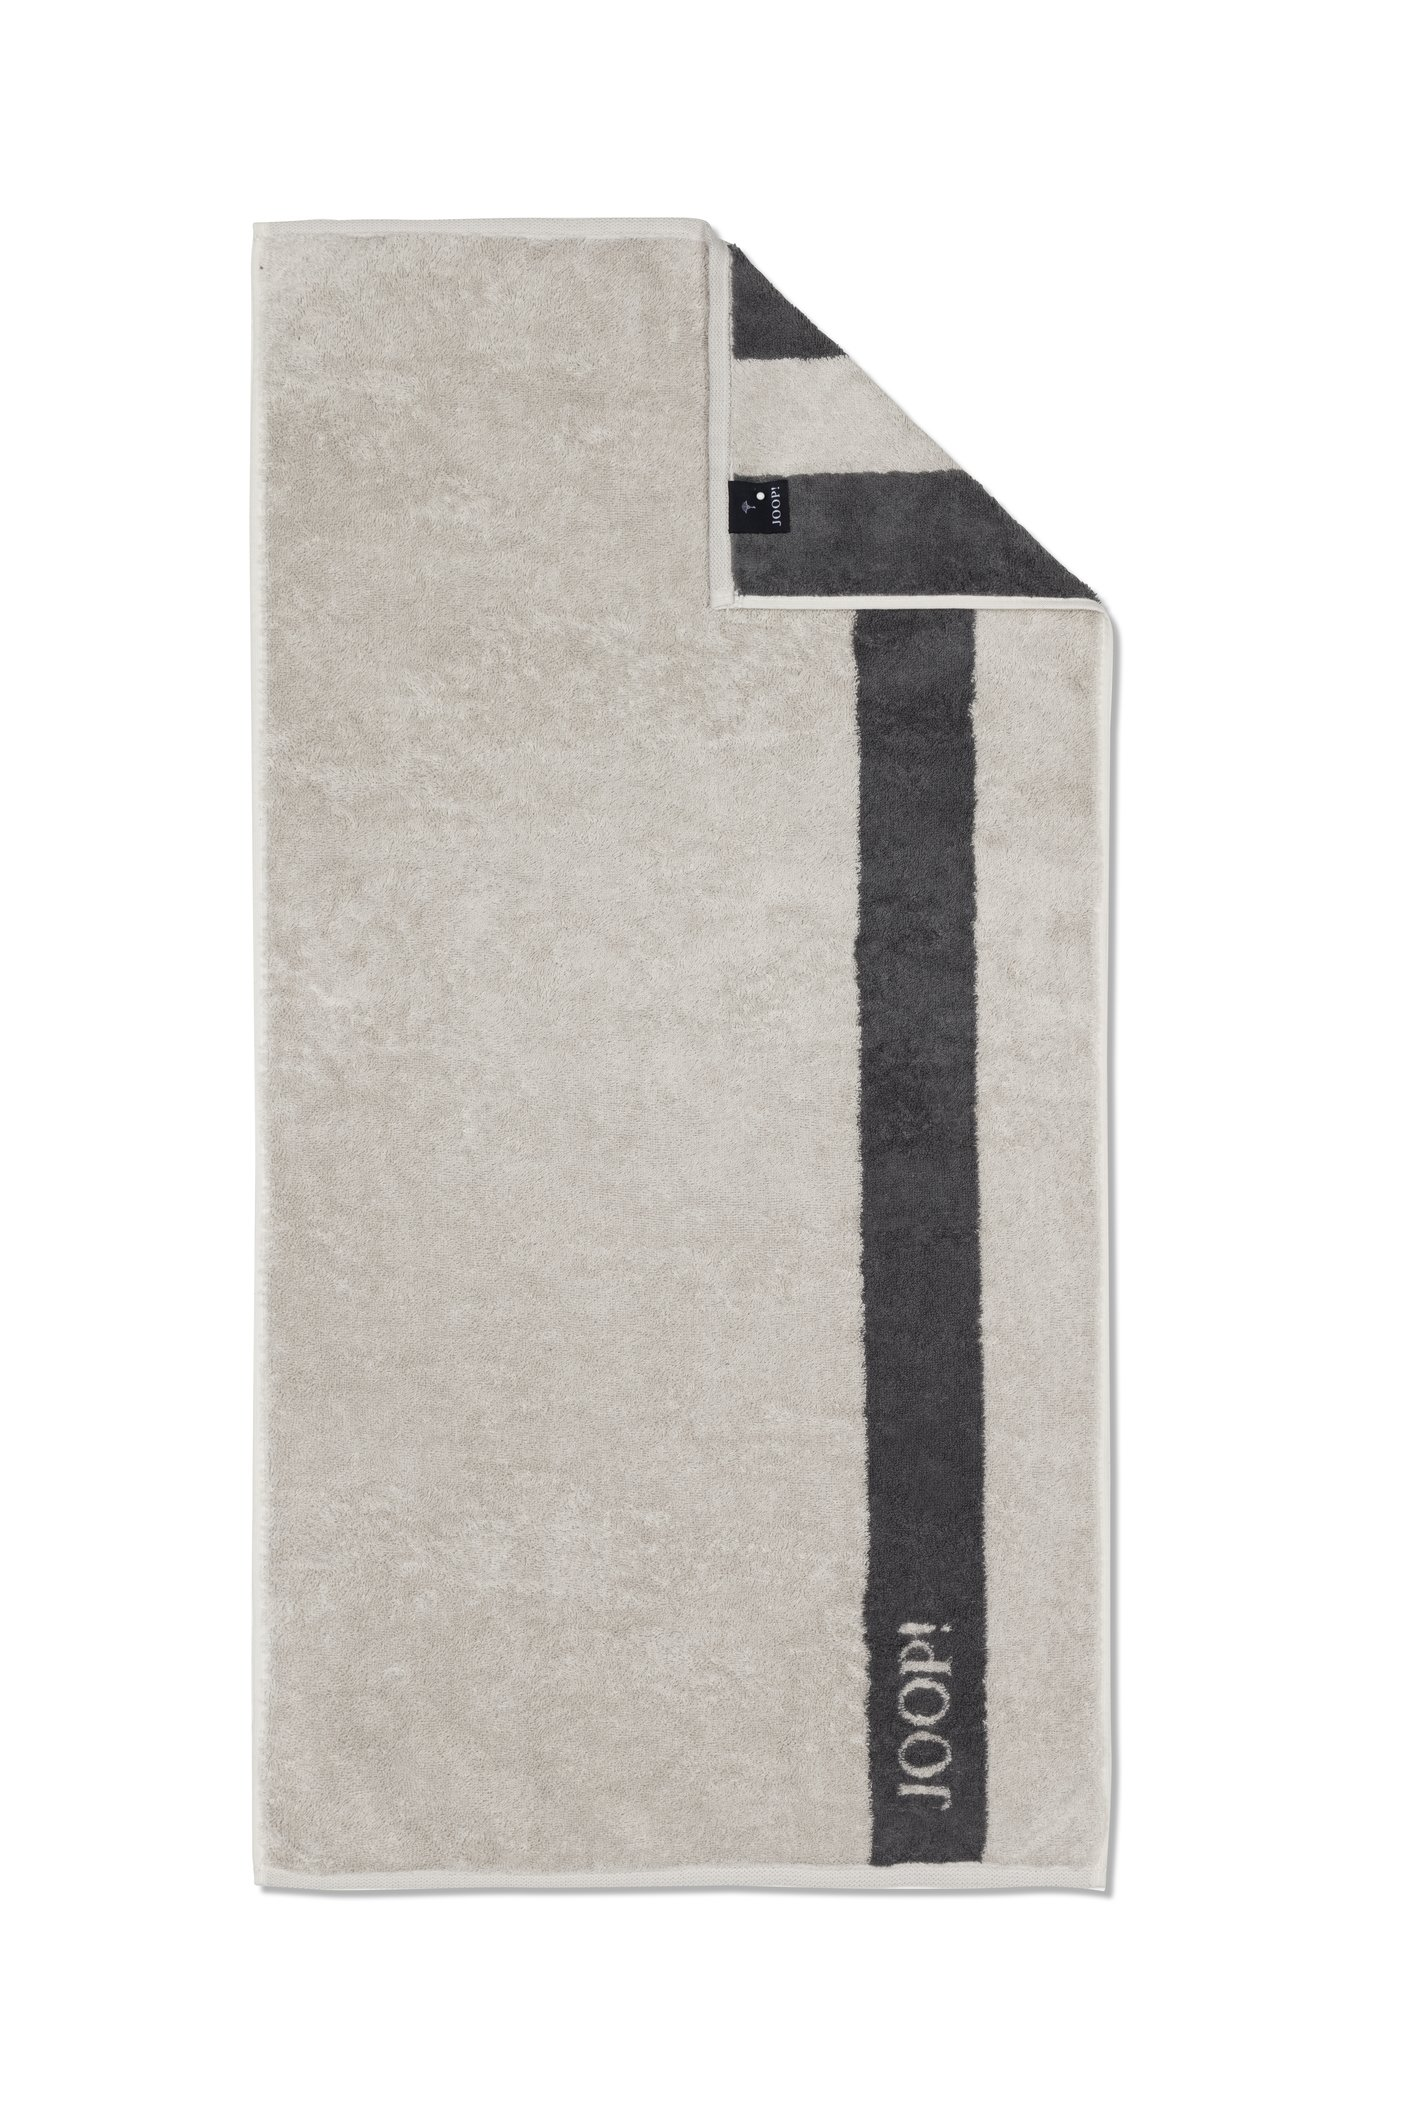 JOOP! Frottierkollektion Infinity 1678-37 Sand Saunatuch 80x200 cm